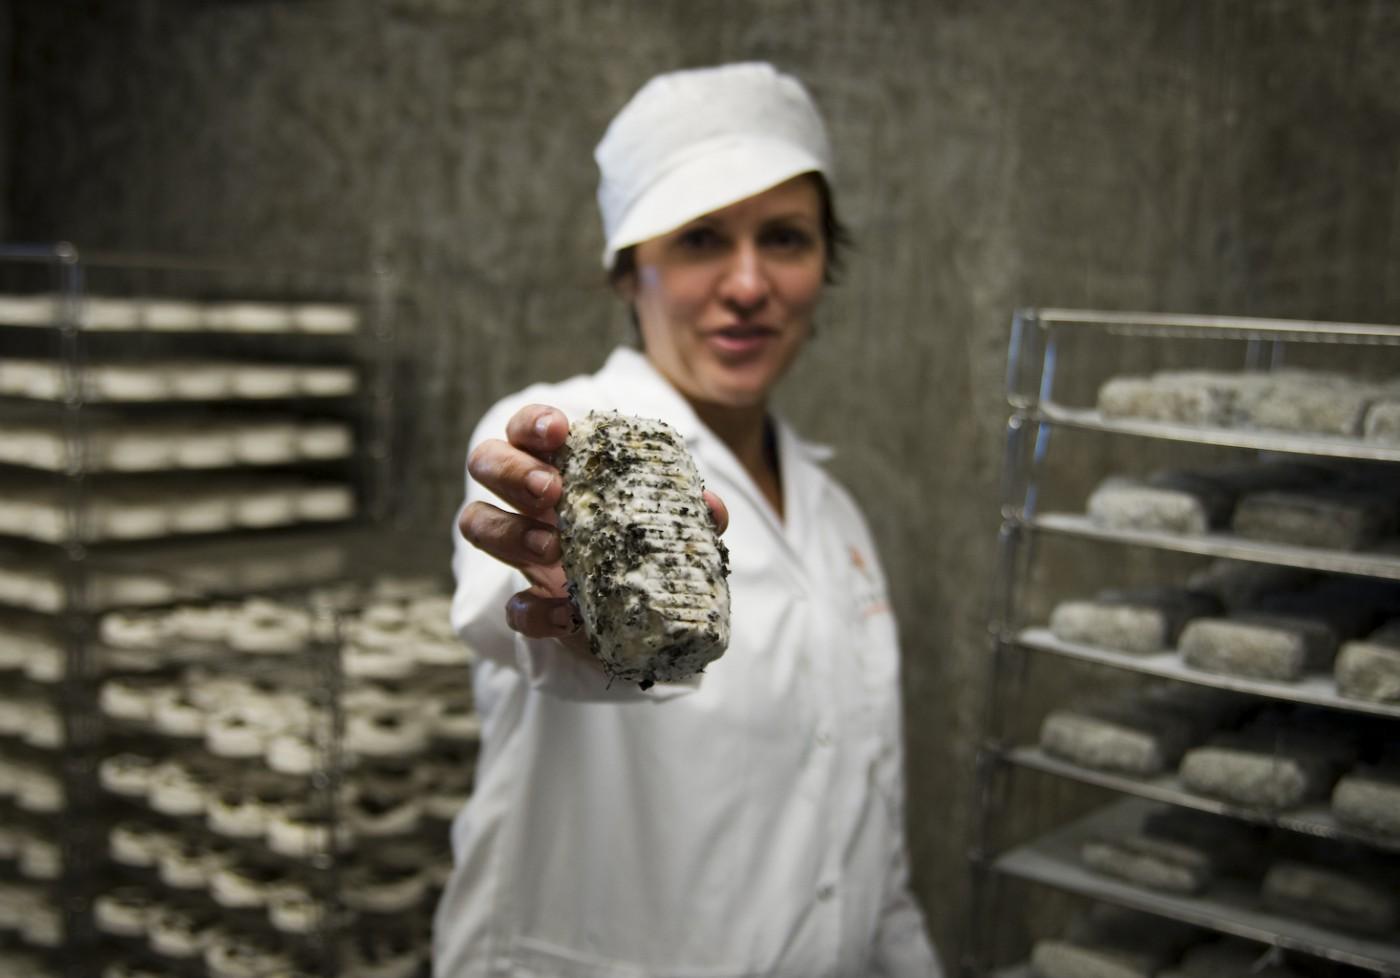 Molly Crealock, </span><span><em>Petra Cooper, Fifth Town Artisan Cheese, 2008</em>, </span><span>Giclee Print, 13x19